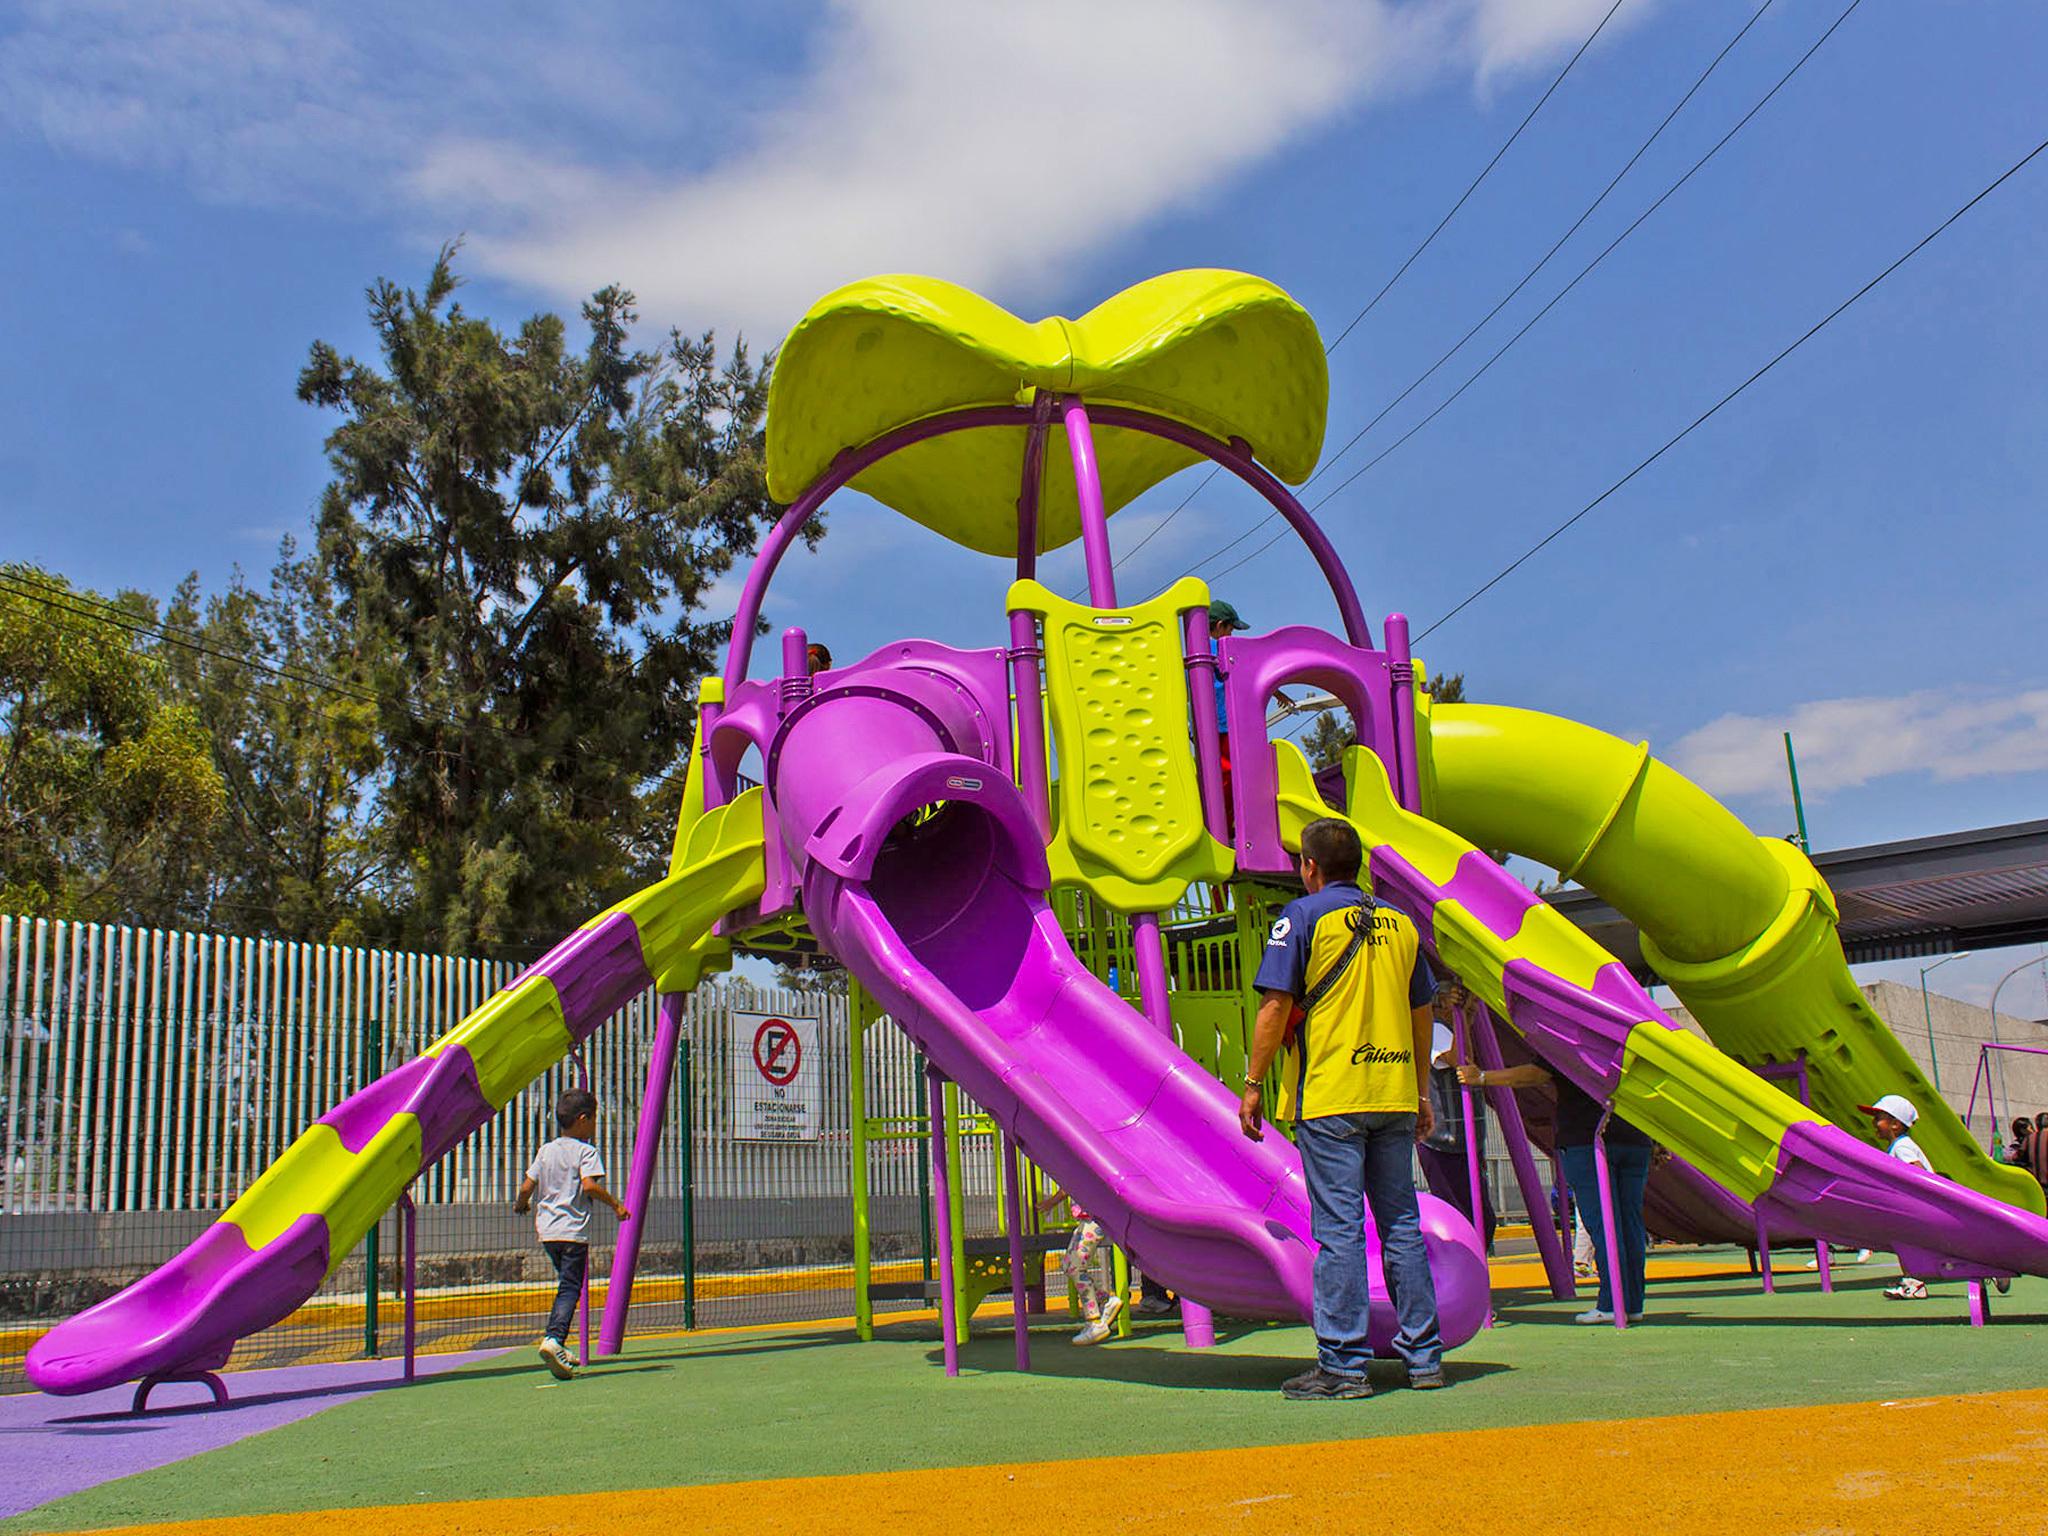 Juegos infantiles en Parque lineal Iztapalapa